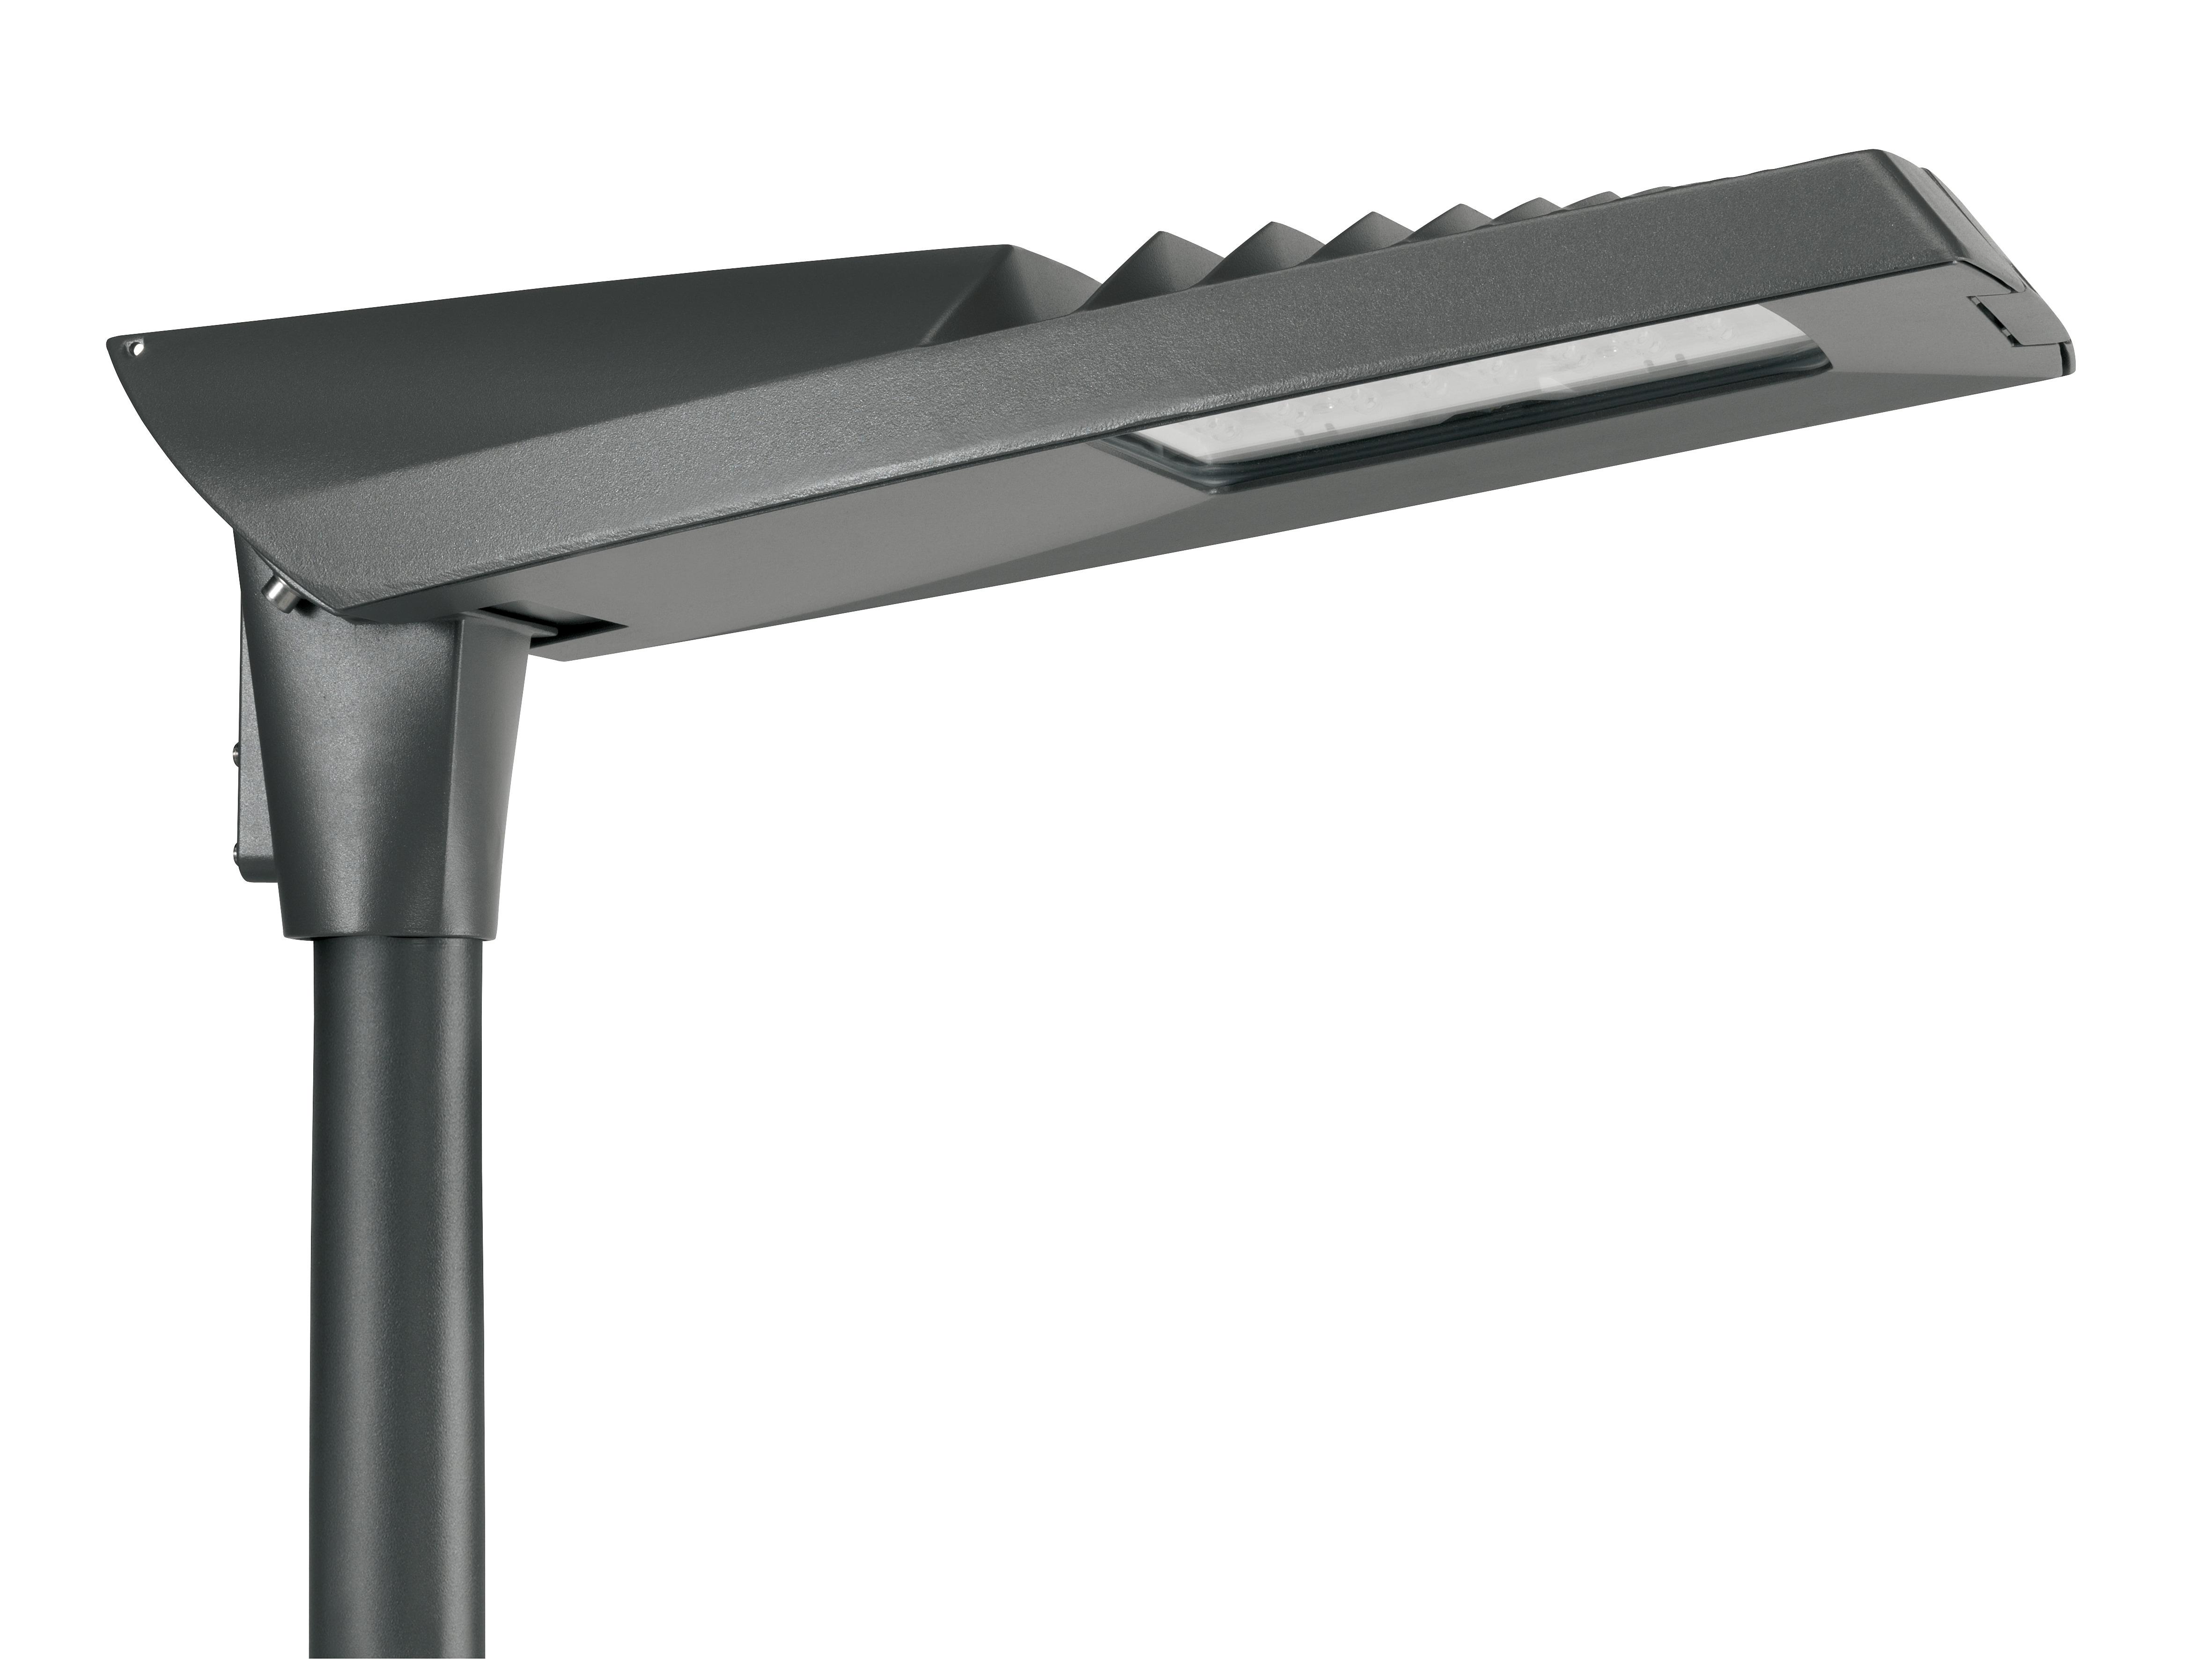 philips citytouch intelligente stadtbeleuchtung drahtlos. Black Bedroom Furniture Sets. Home Design Ideas